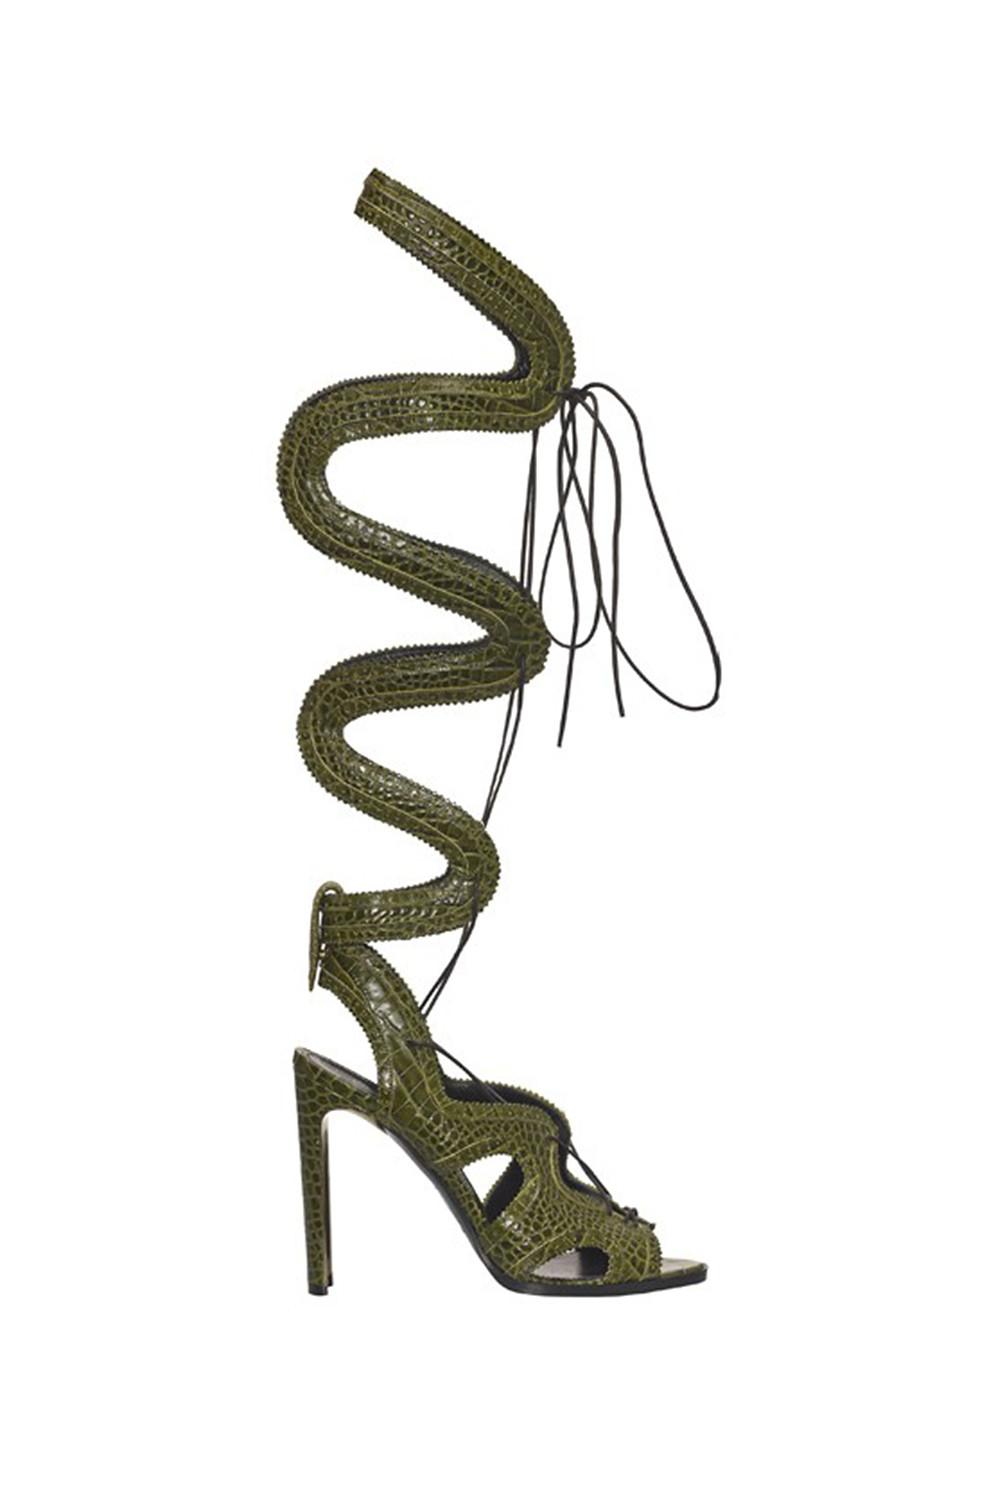 03-04-heeled-gladiator Nicholas Kirkwood for Erdem.jpg